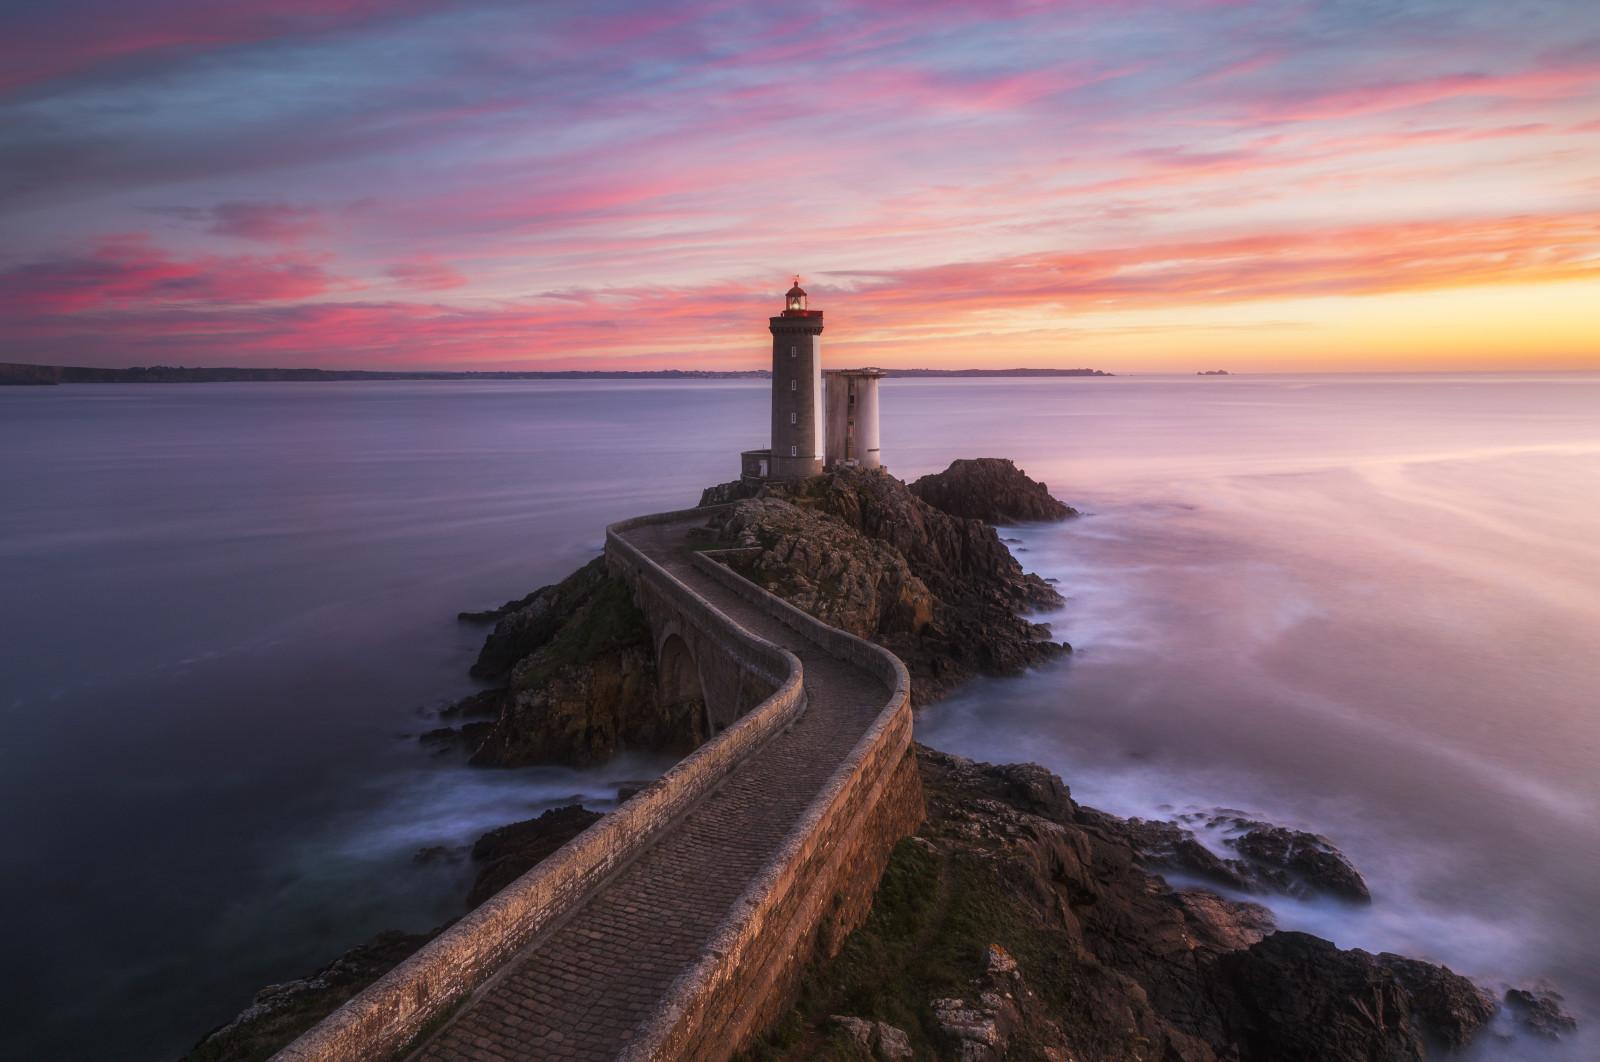 Wallpaper : landscape, sunset, sea, rock, shore, red ...